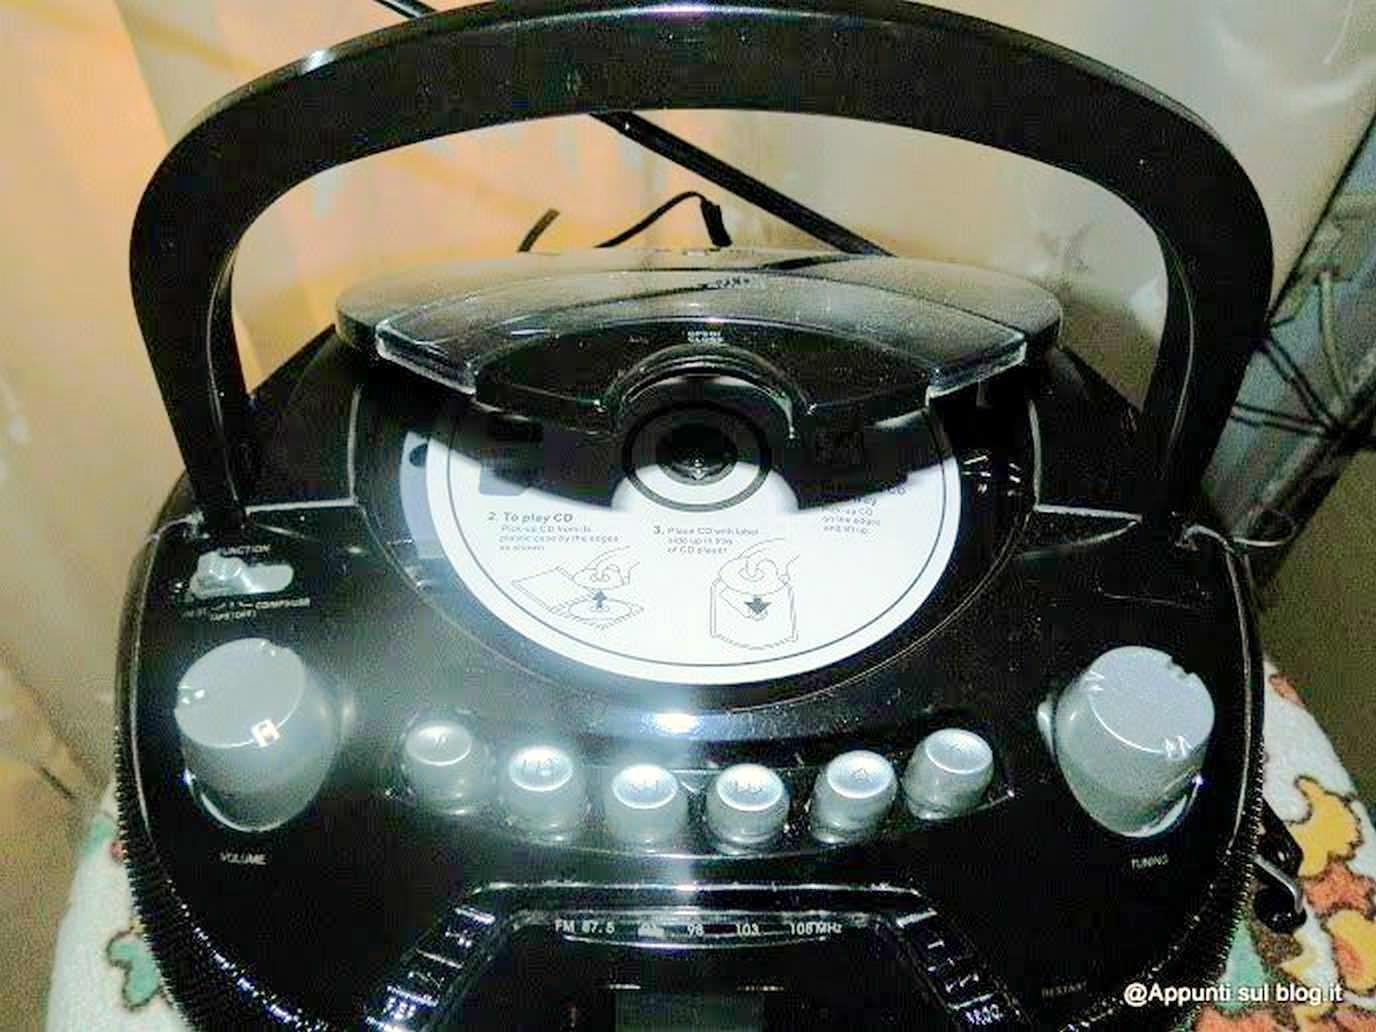 auna Beeboy radioregistratore CD MP3 nero multimedia